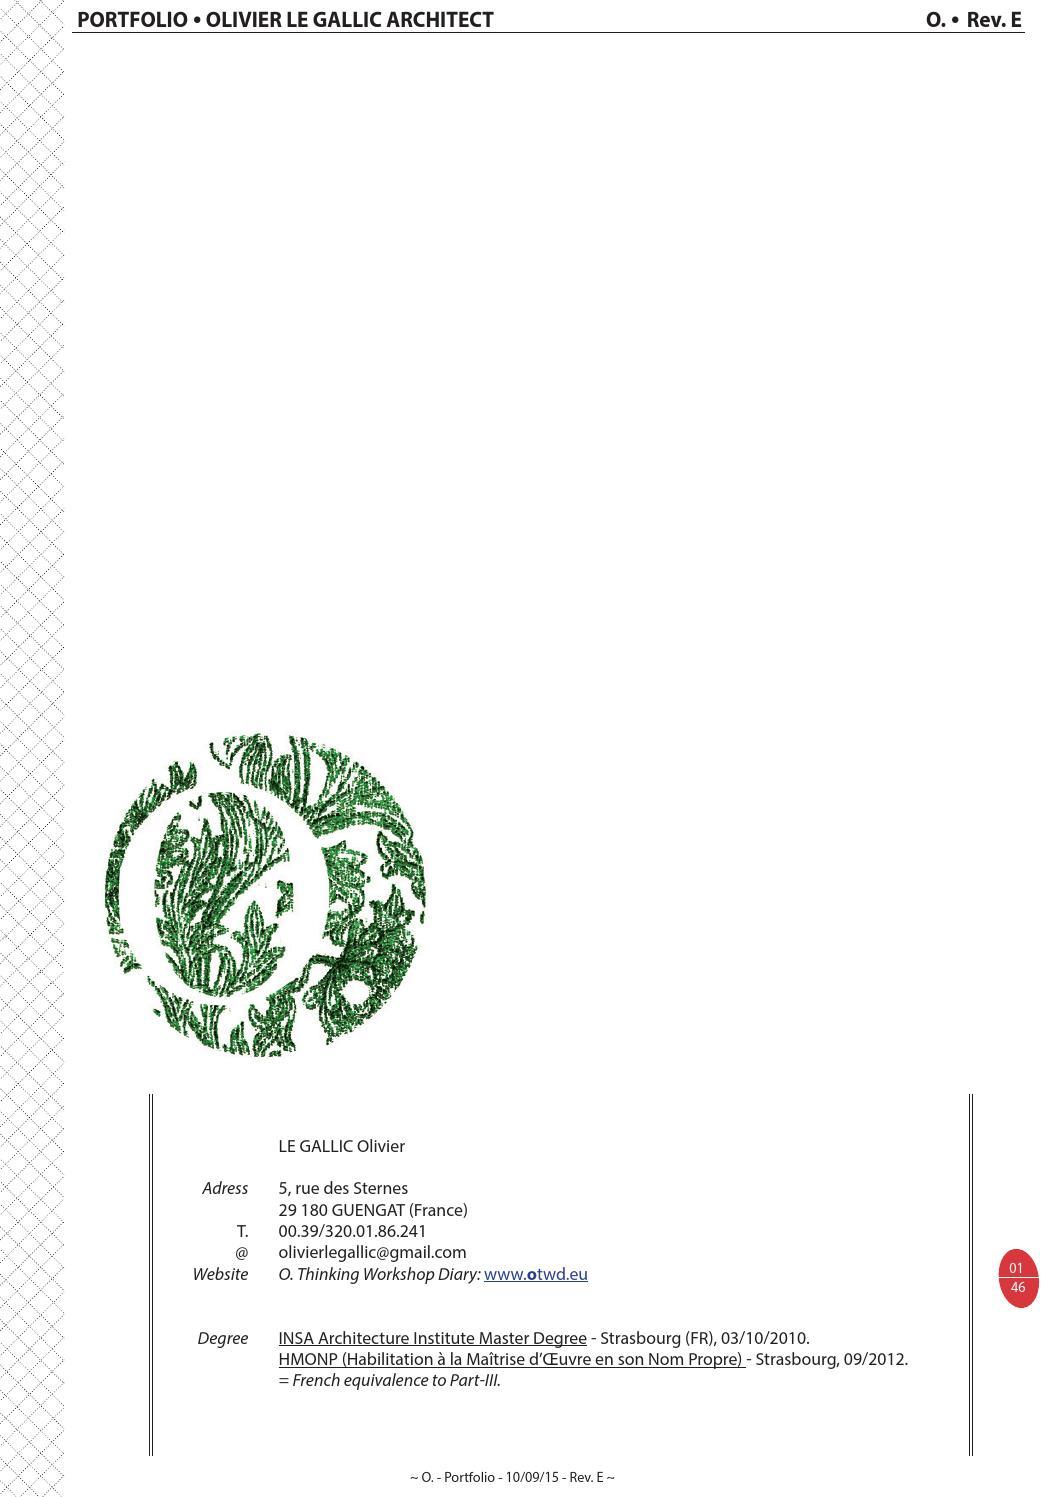 Ordre Des Architectes Amiens olivier le gallic portfolioolivier - issuu